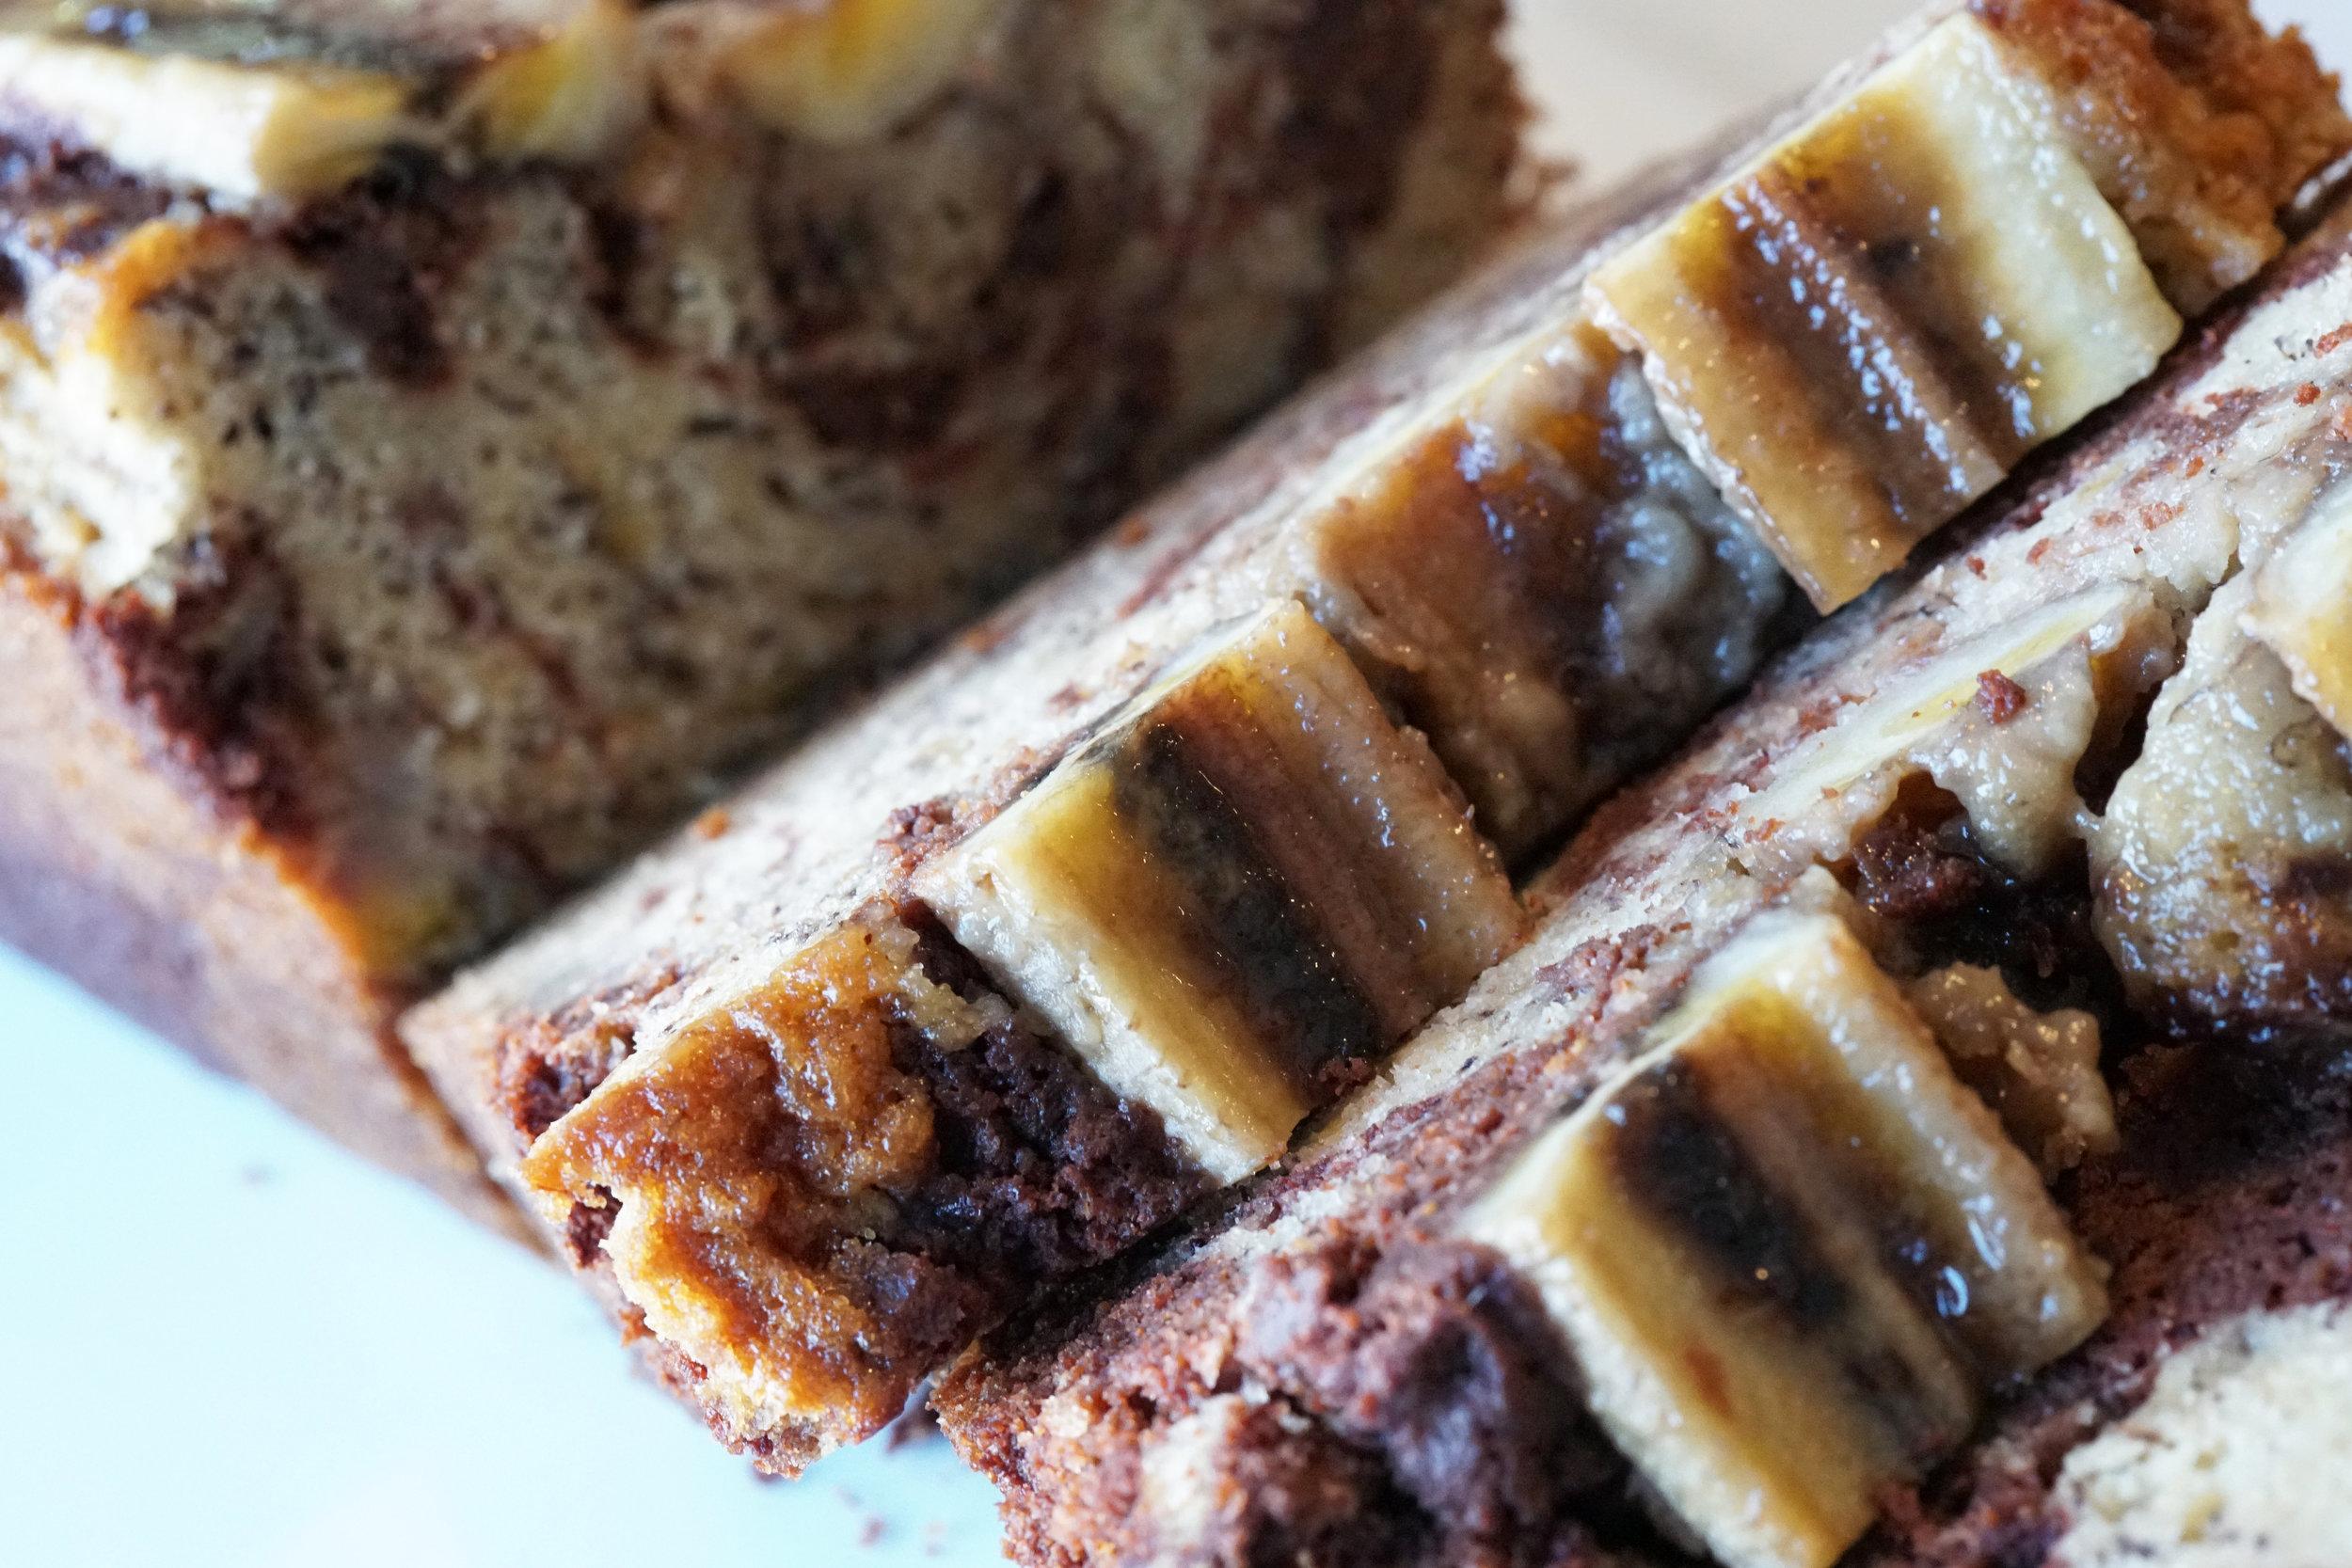 Chocolate-Banana-Bread-Banana-Top-Fjpg